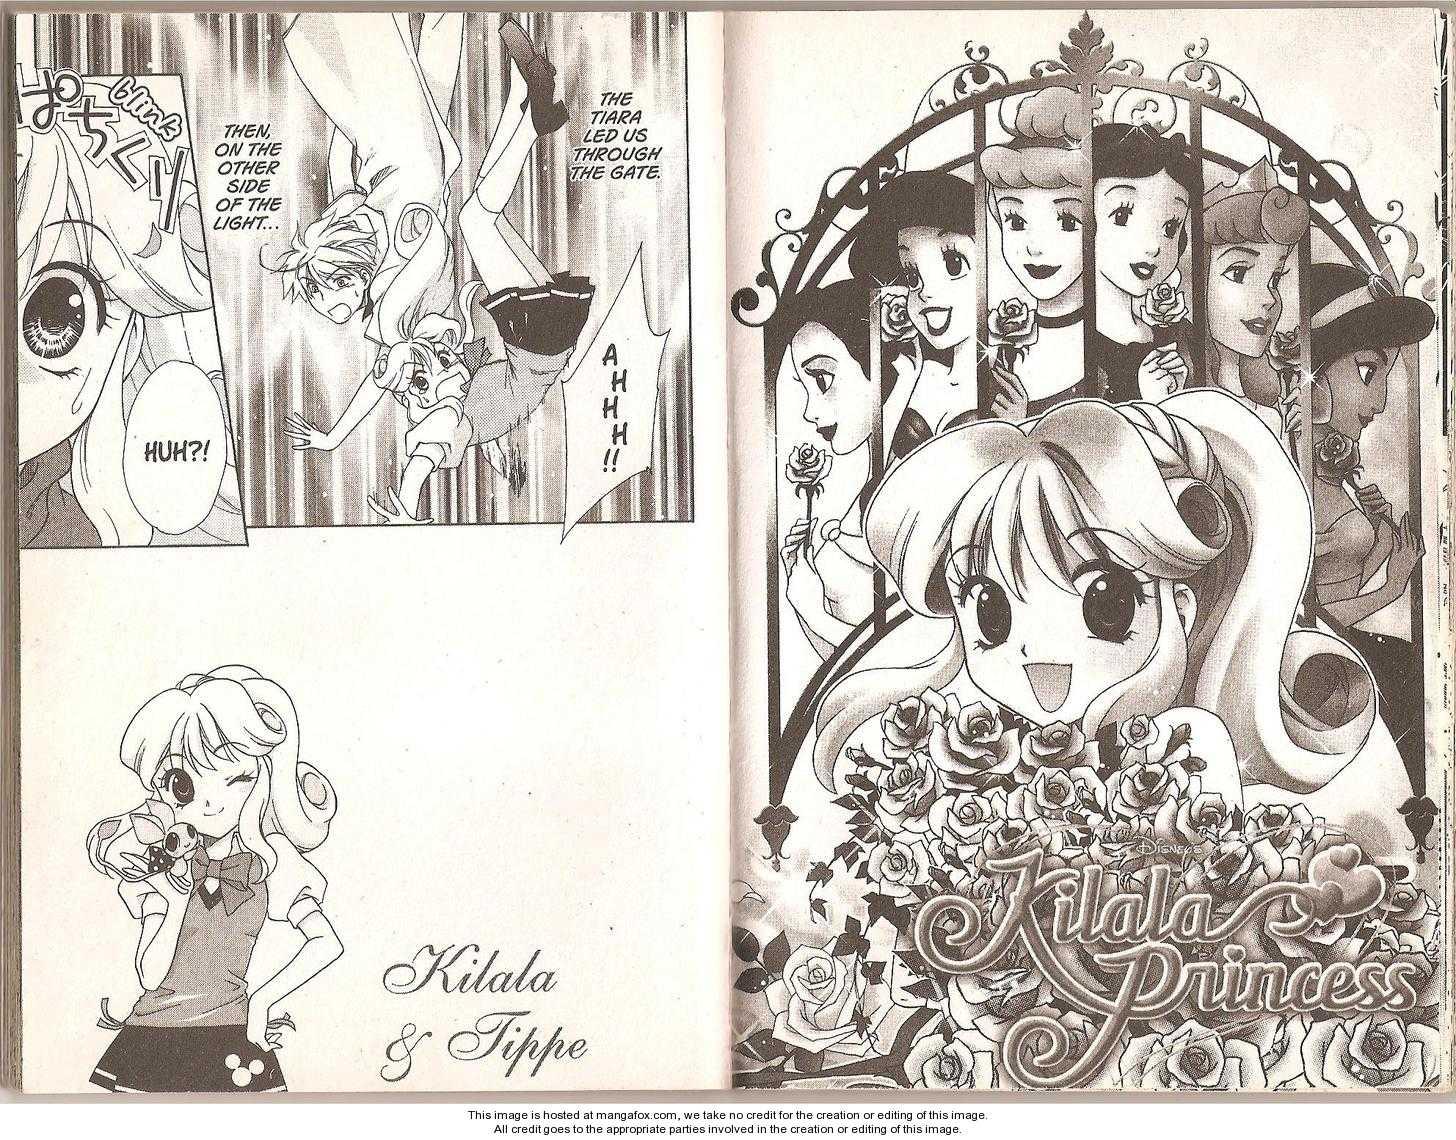 Kilala Princess 2 Page 1